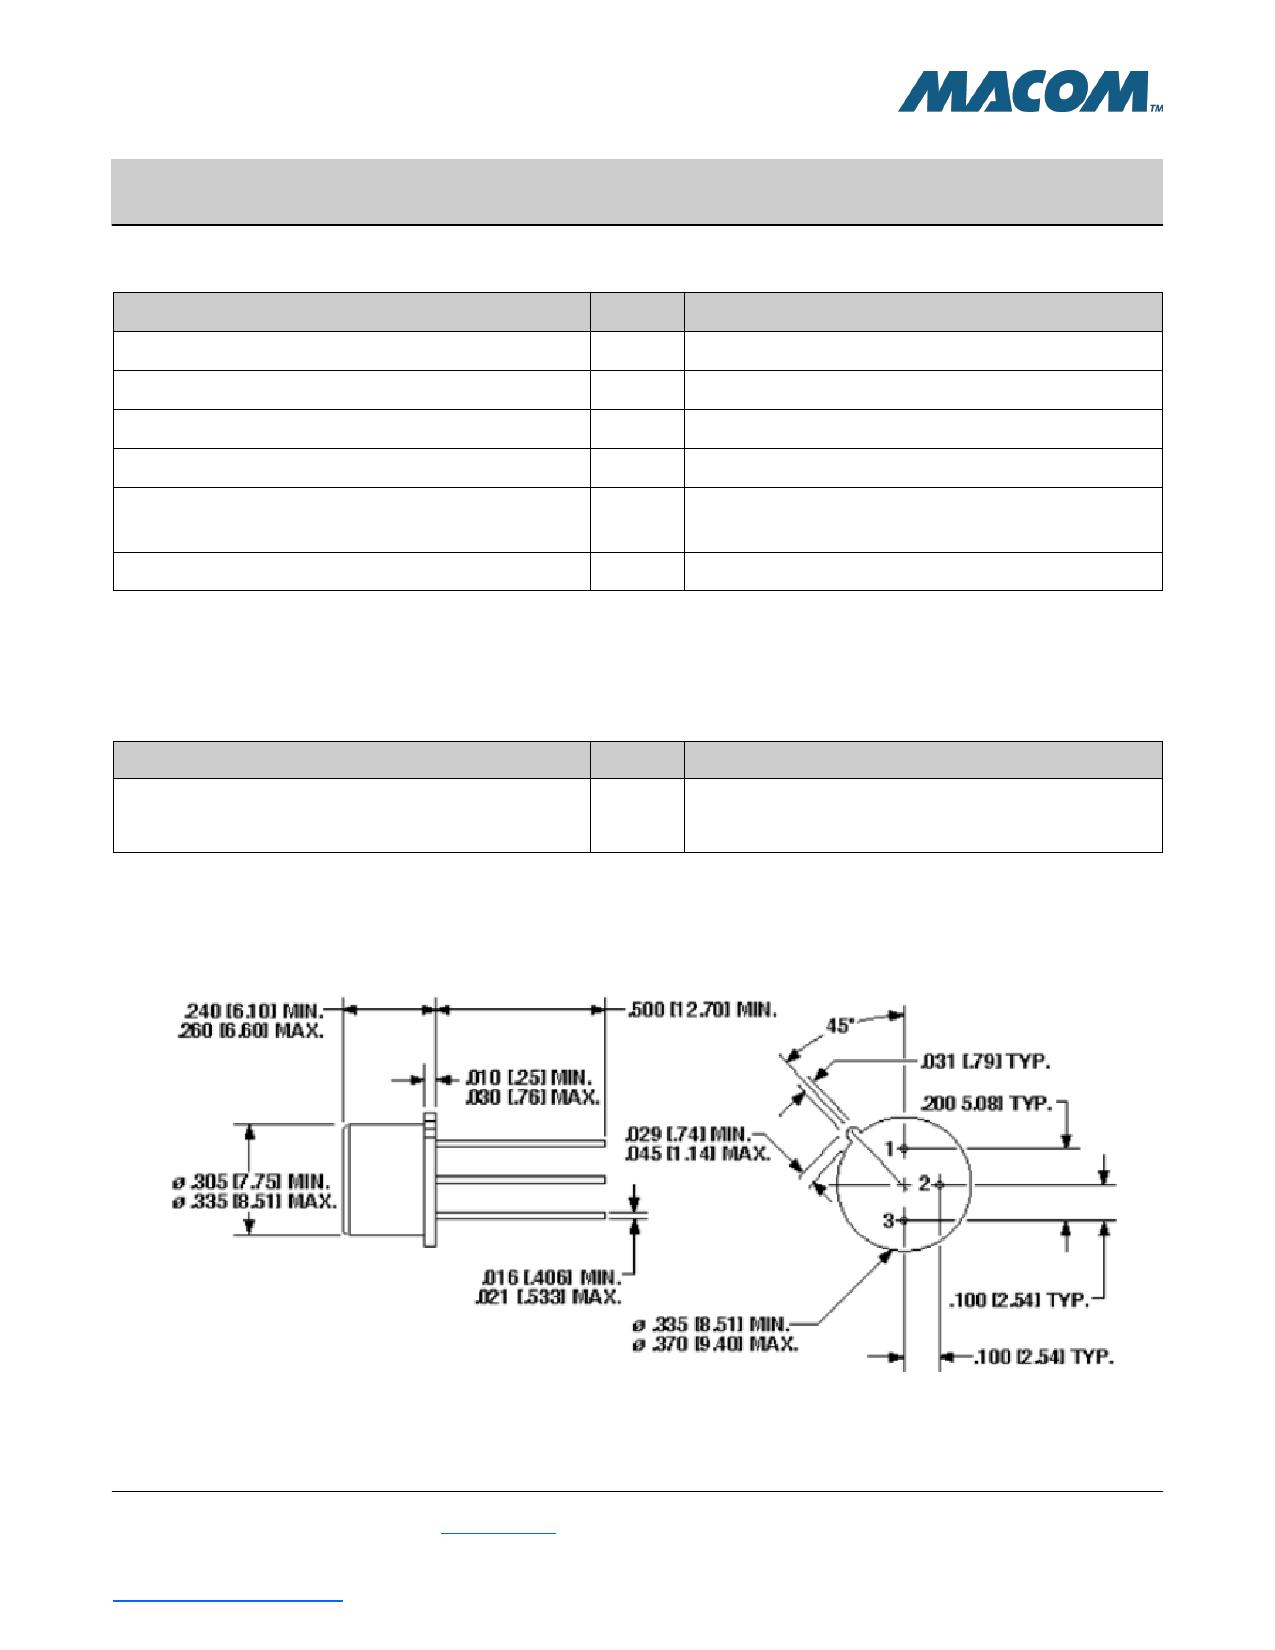 2N4150 pdf, equivalent, schematic